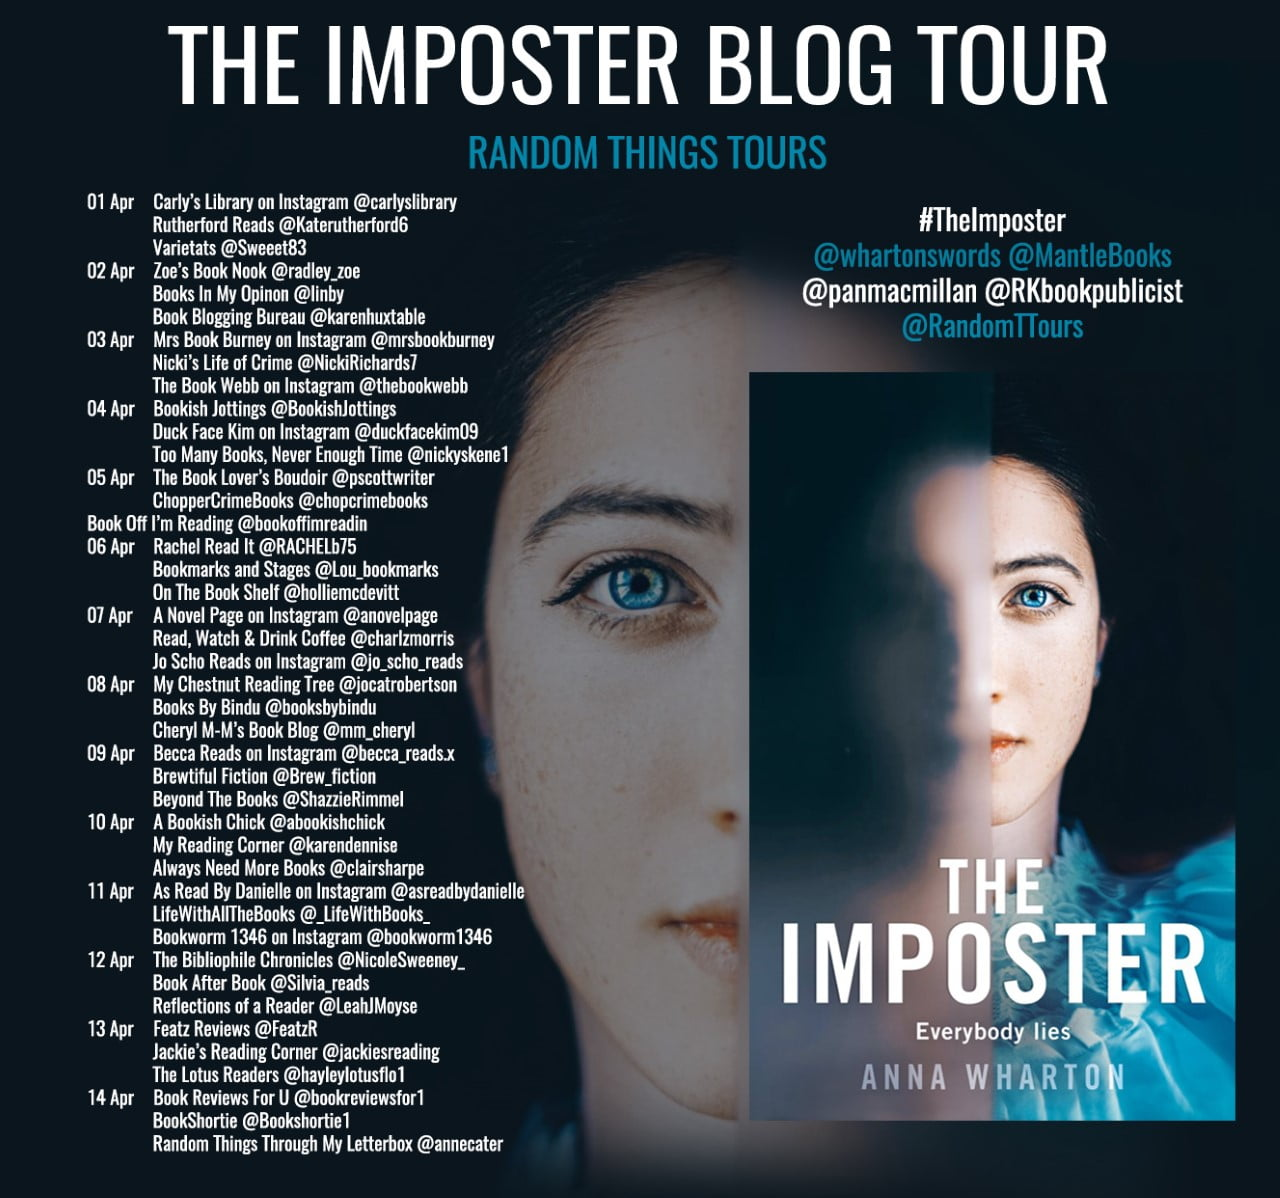 The Imposter – Anna Wharton